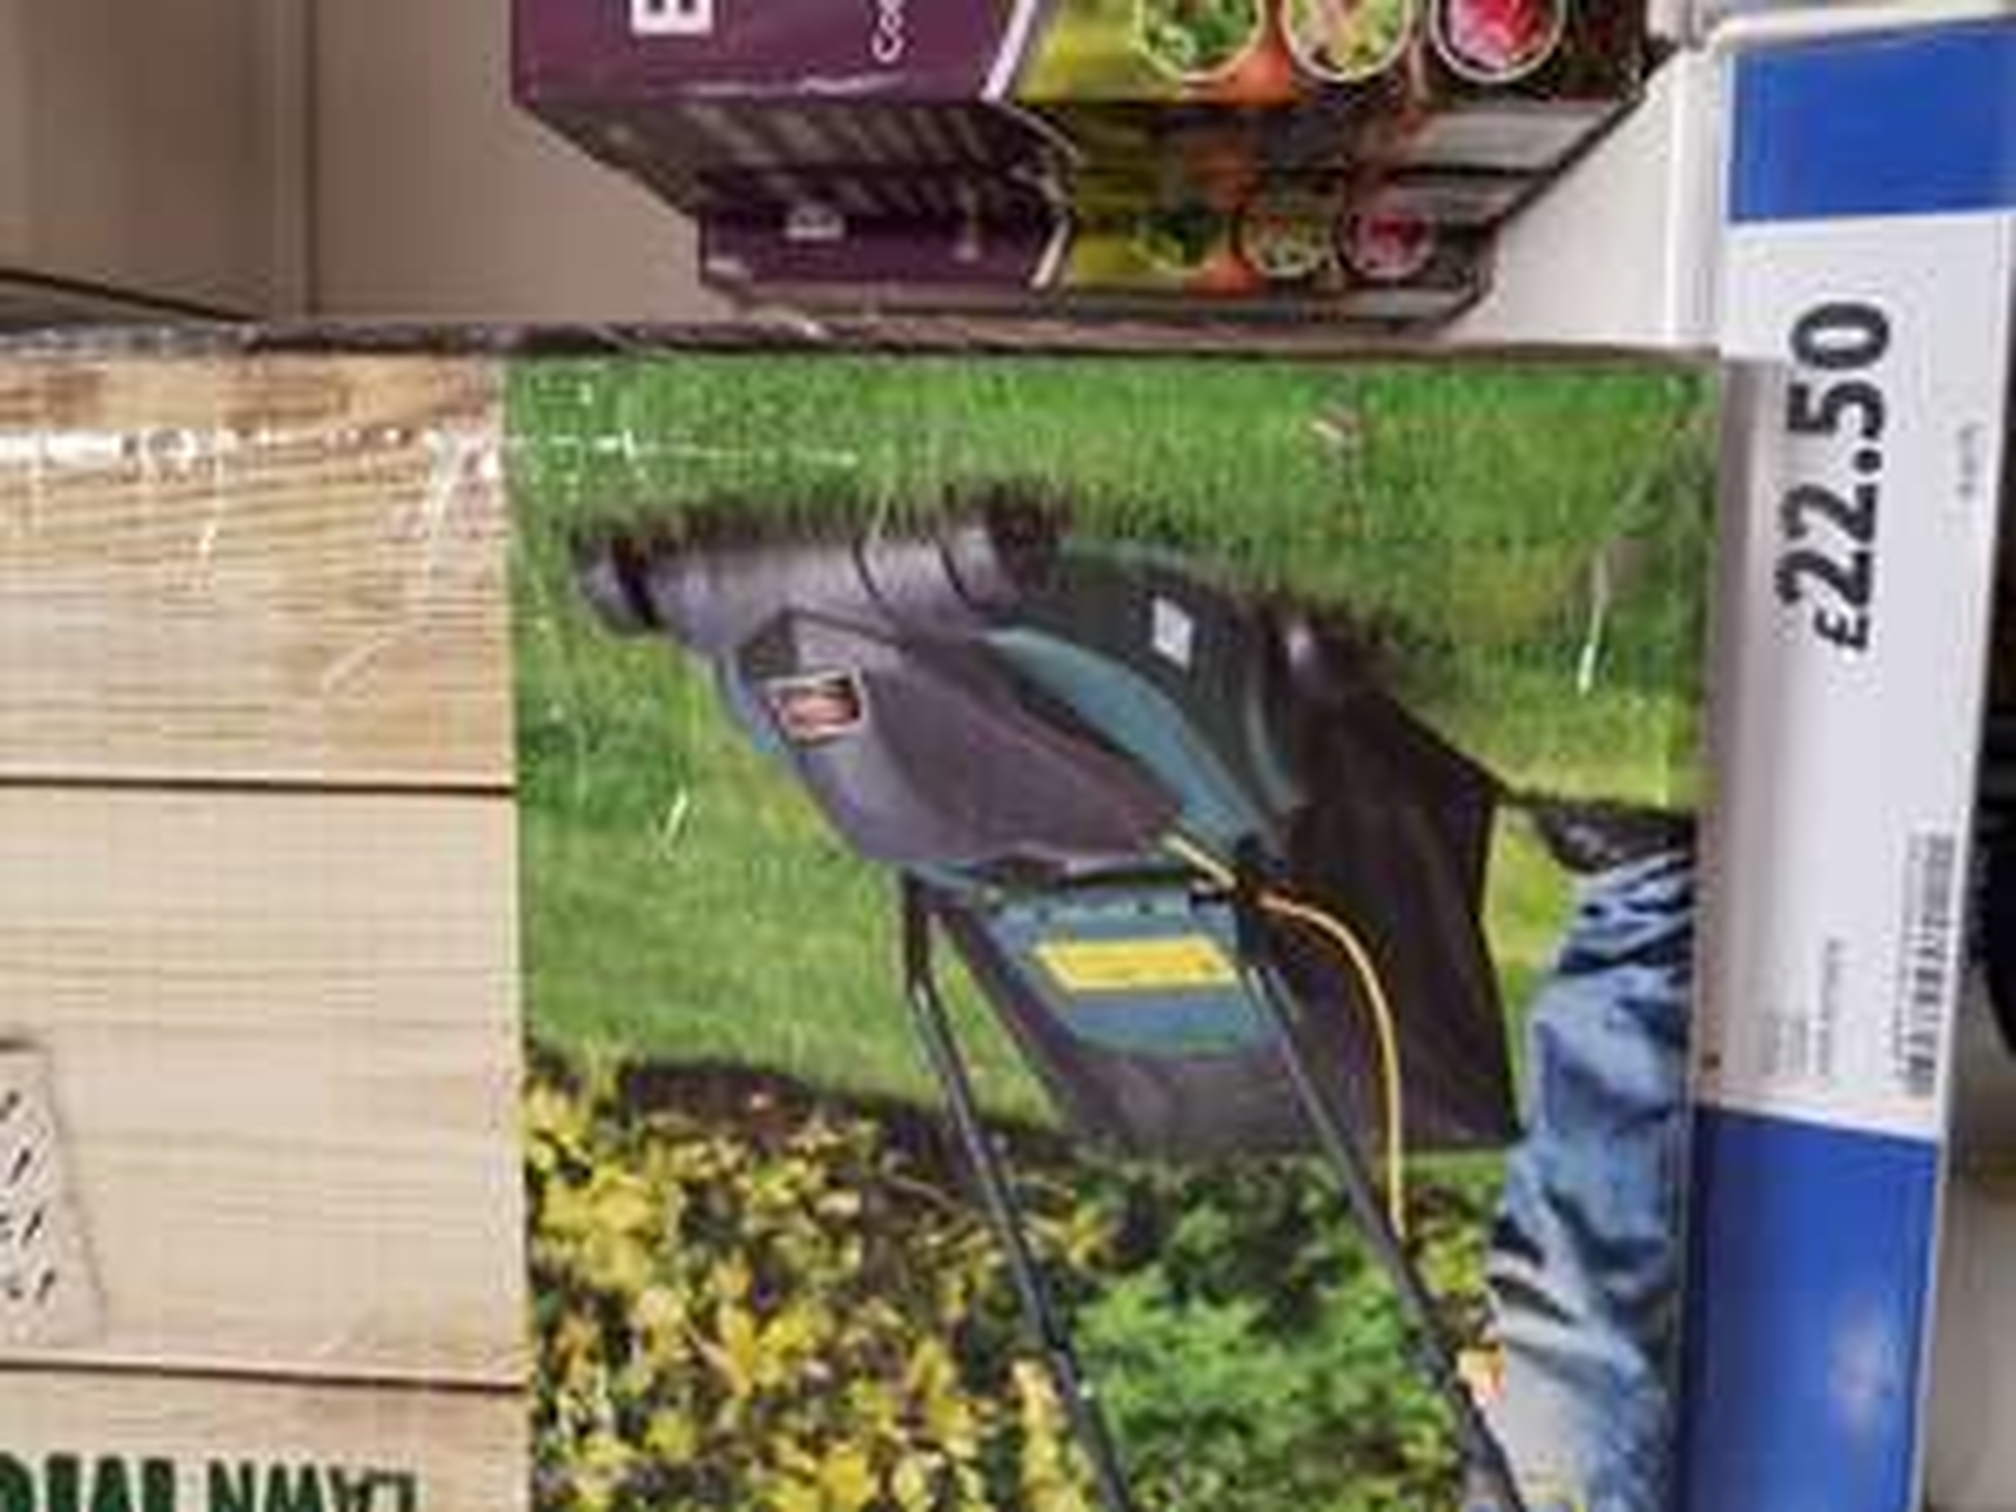 Tesco 1000w lawnmower, Tesco Longton - £22.50 @ Tesco (Longton)